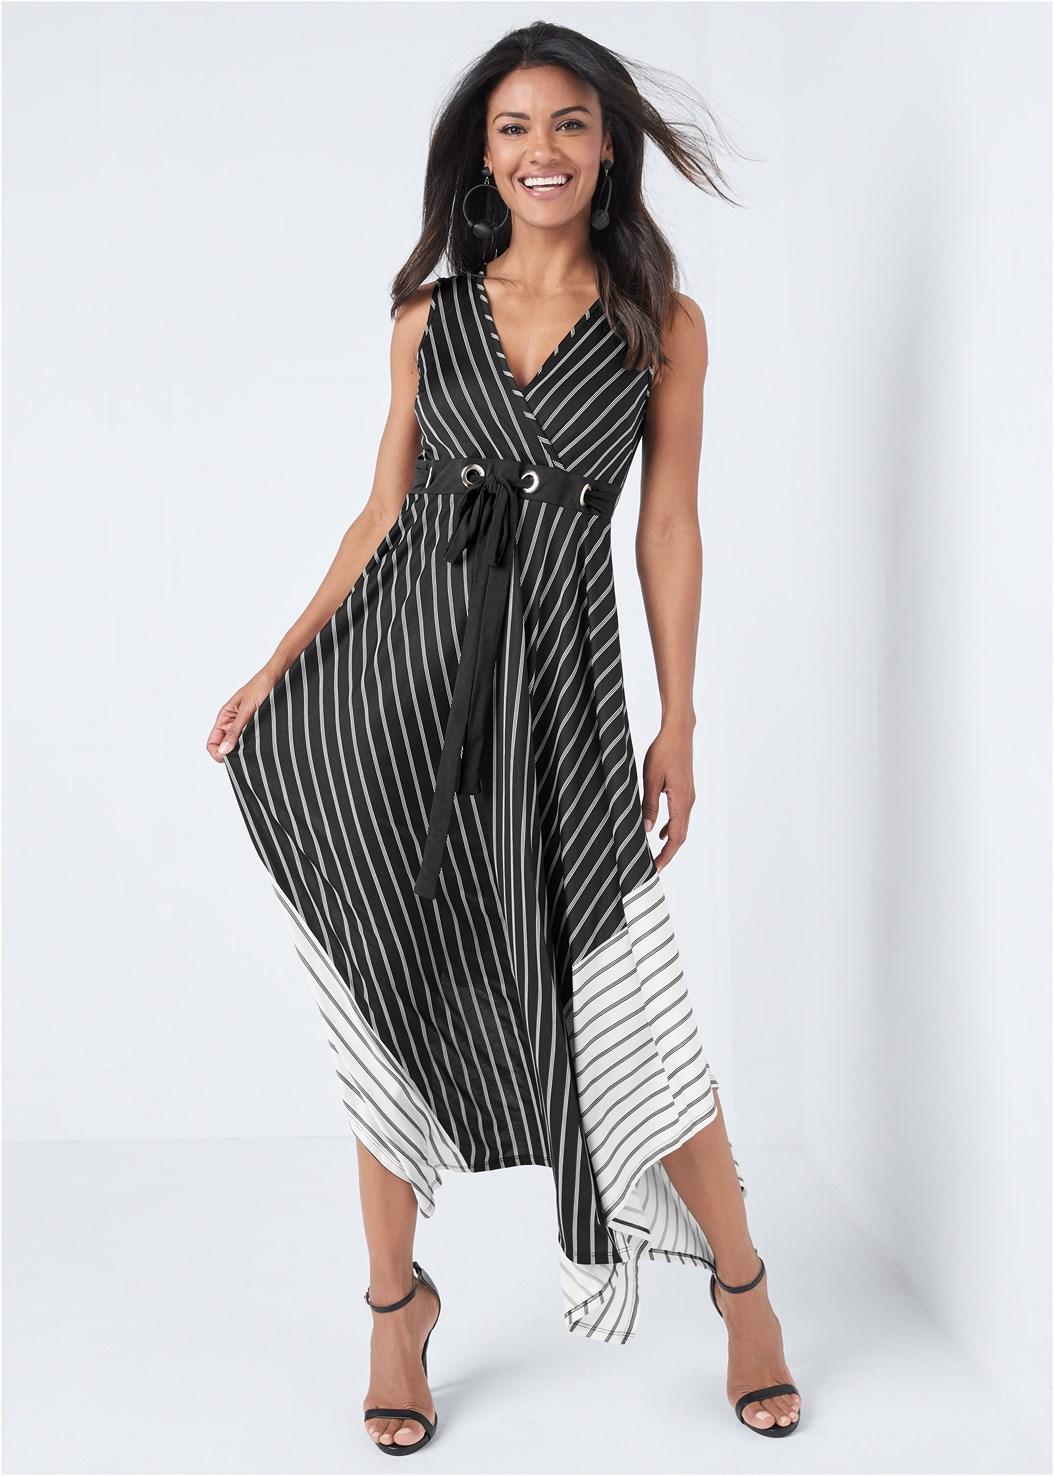 Striped Color Blocked Dress,Kissable Convertible Bra,Ankle Strap Heels,Bauble Hoop Earrings